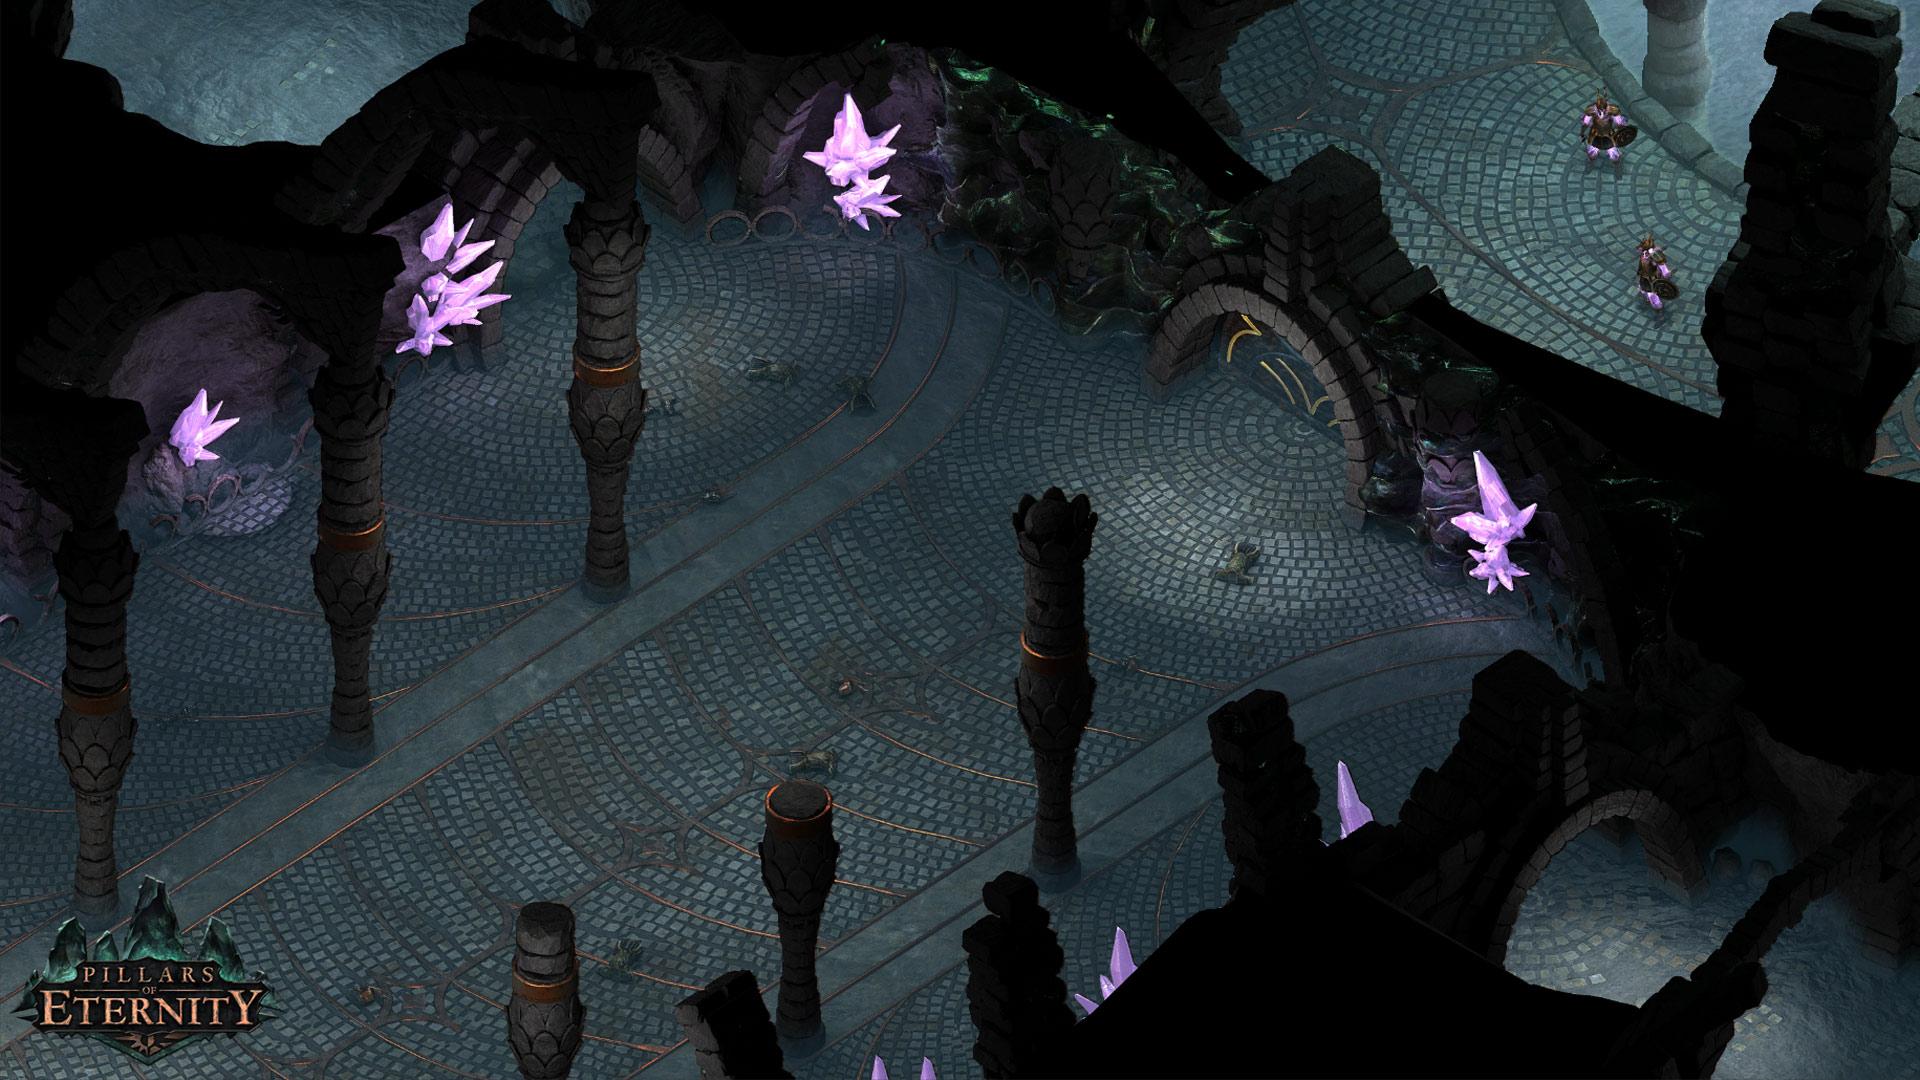 Pillars of Eternity Windows, Mac game